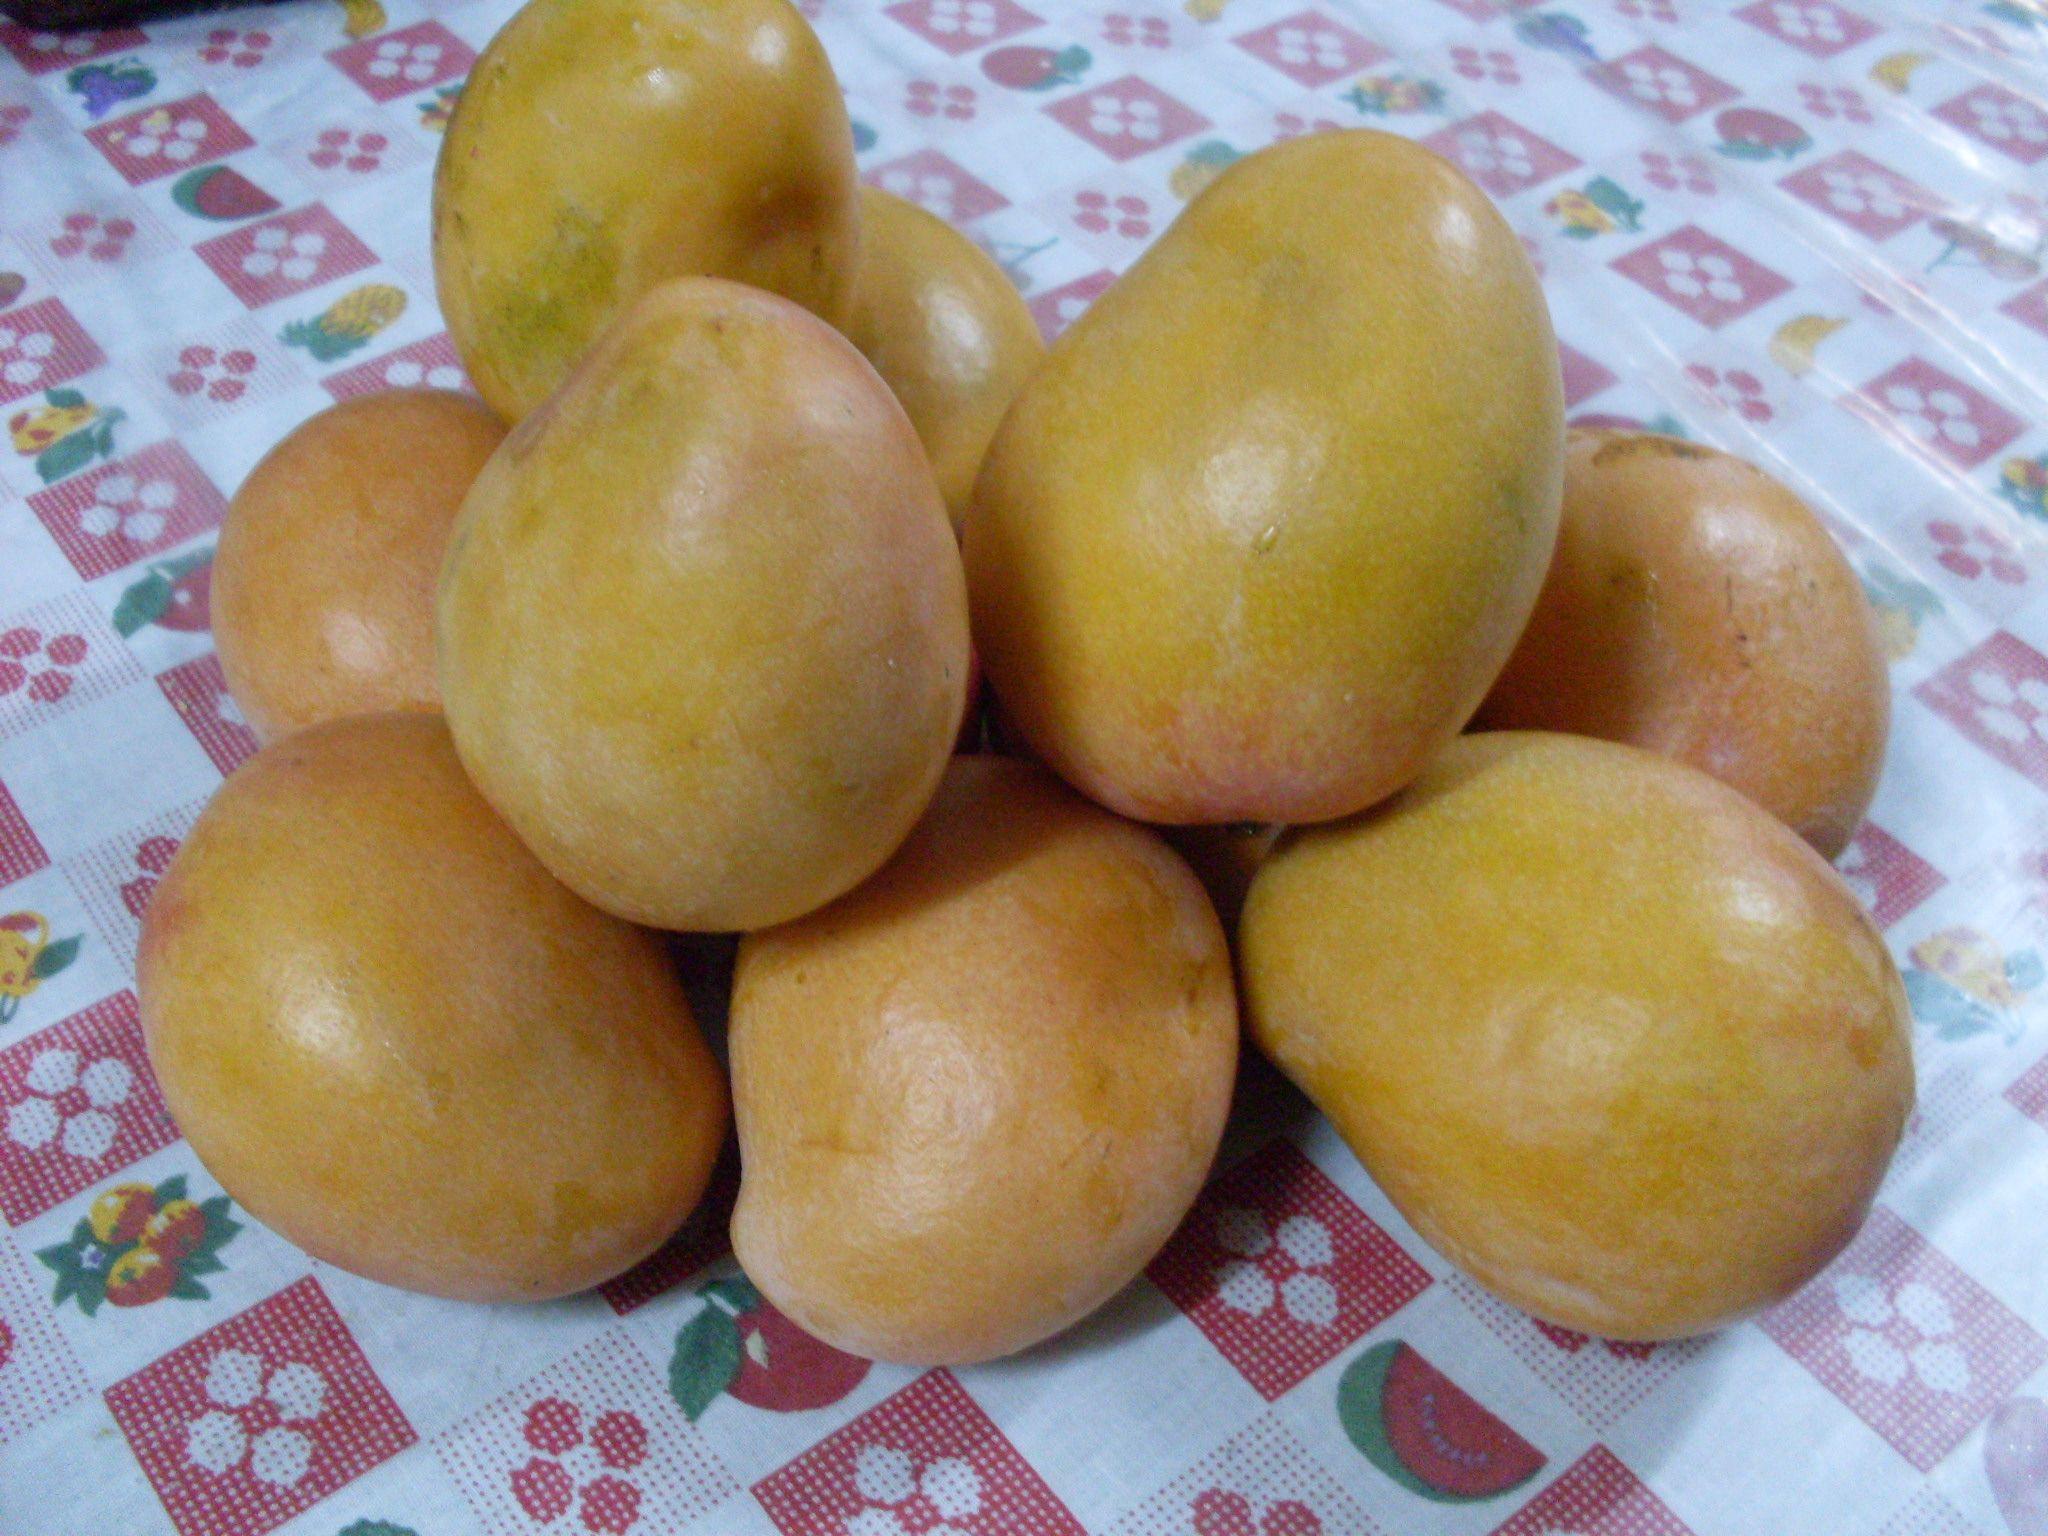 Mangos ya lavados   Frutas de mi pais   Pinterest